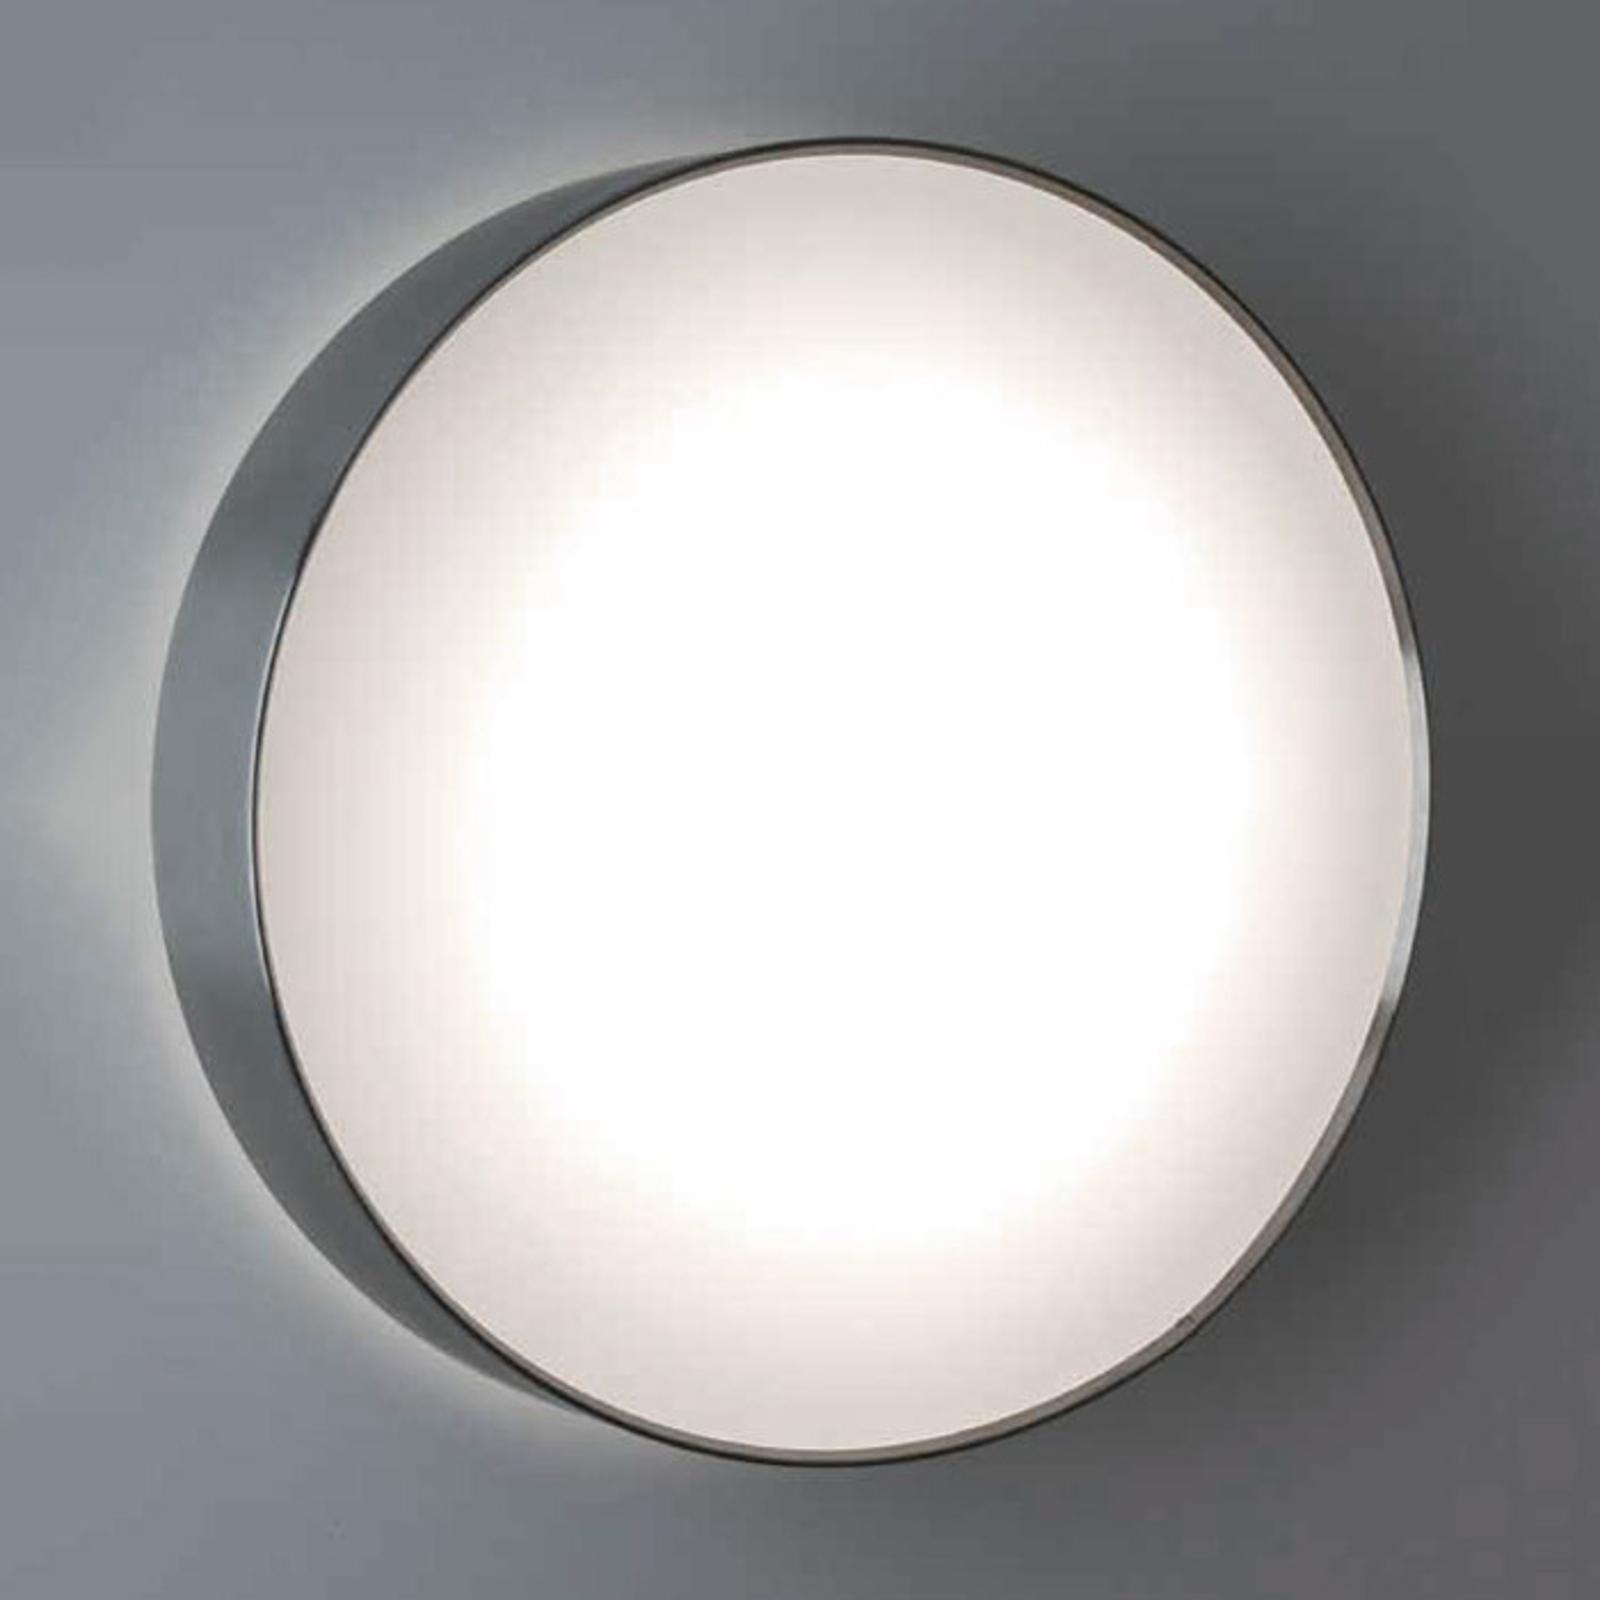 rvs plafondlamp SUN 4 LED 8 W 4 K